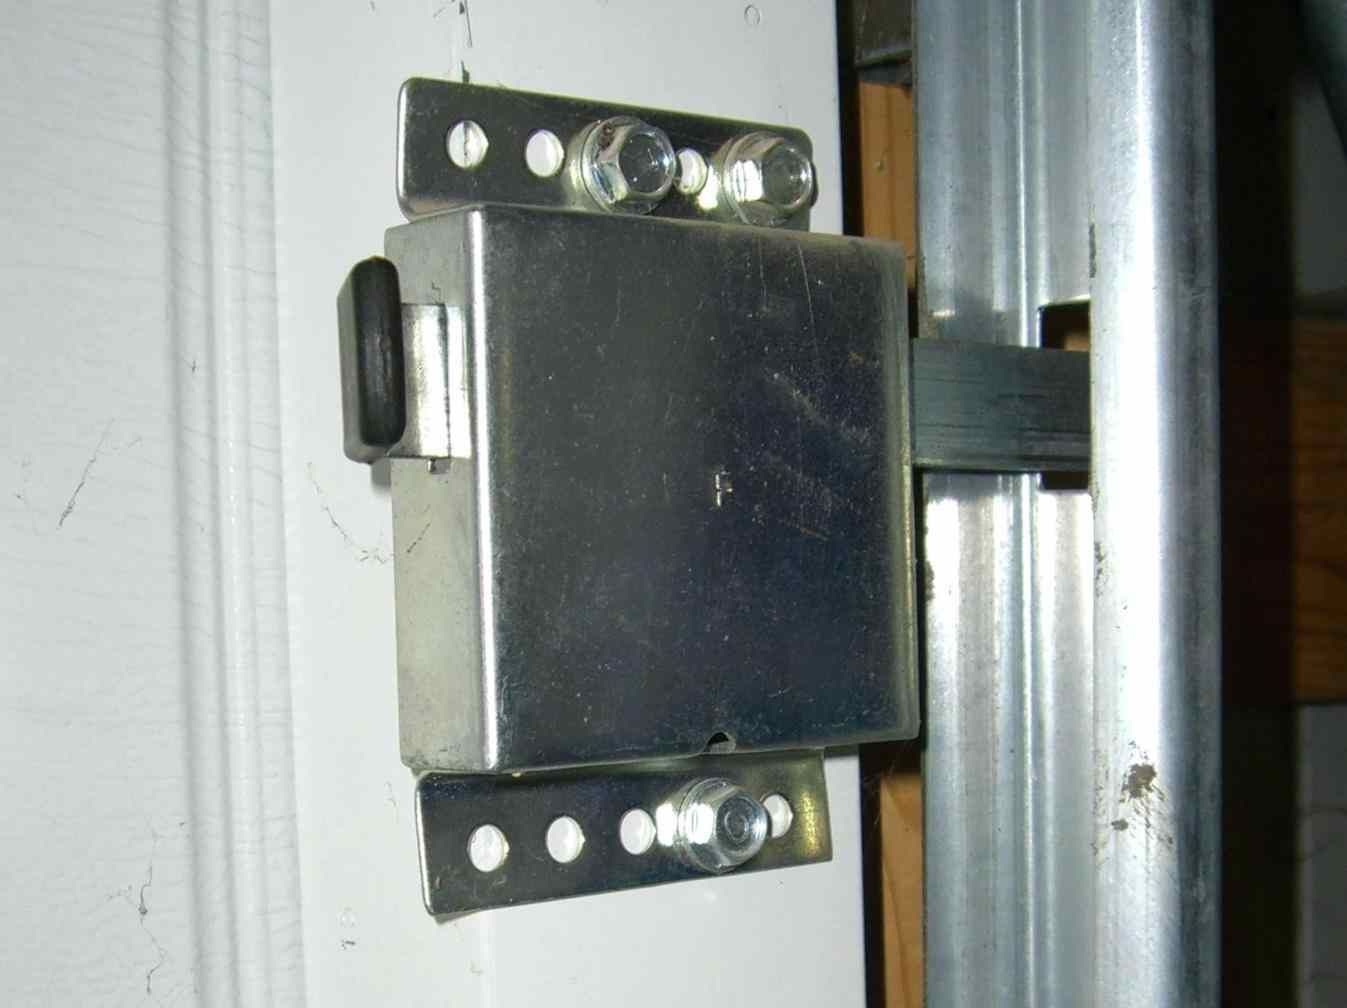 And Handles Picture Album Images Are Ideas French French Doors Lock Door Locks And Handles Picture Garage Door Lock Garage Door Security Automatic Garage Door